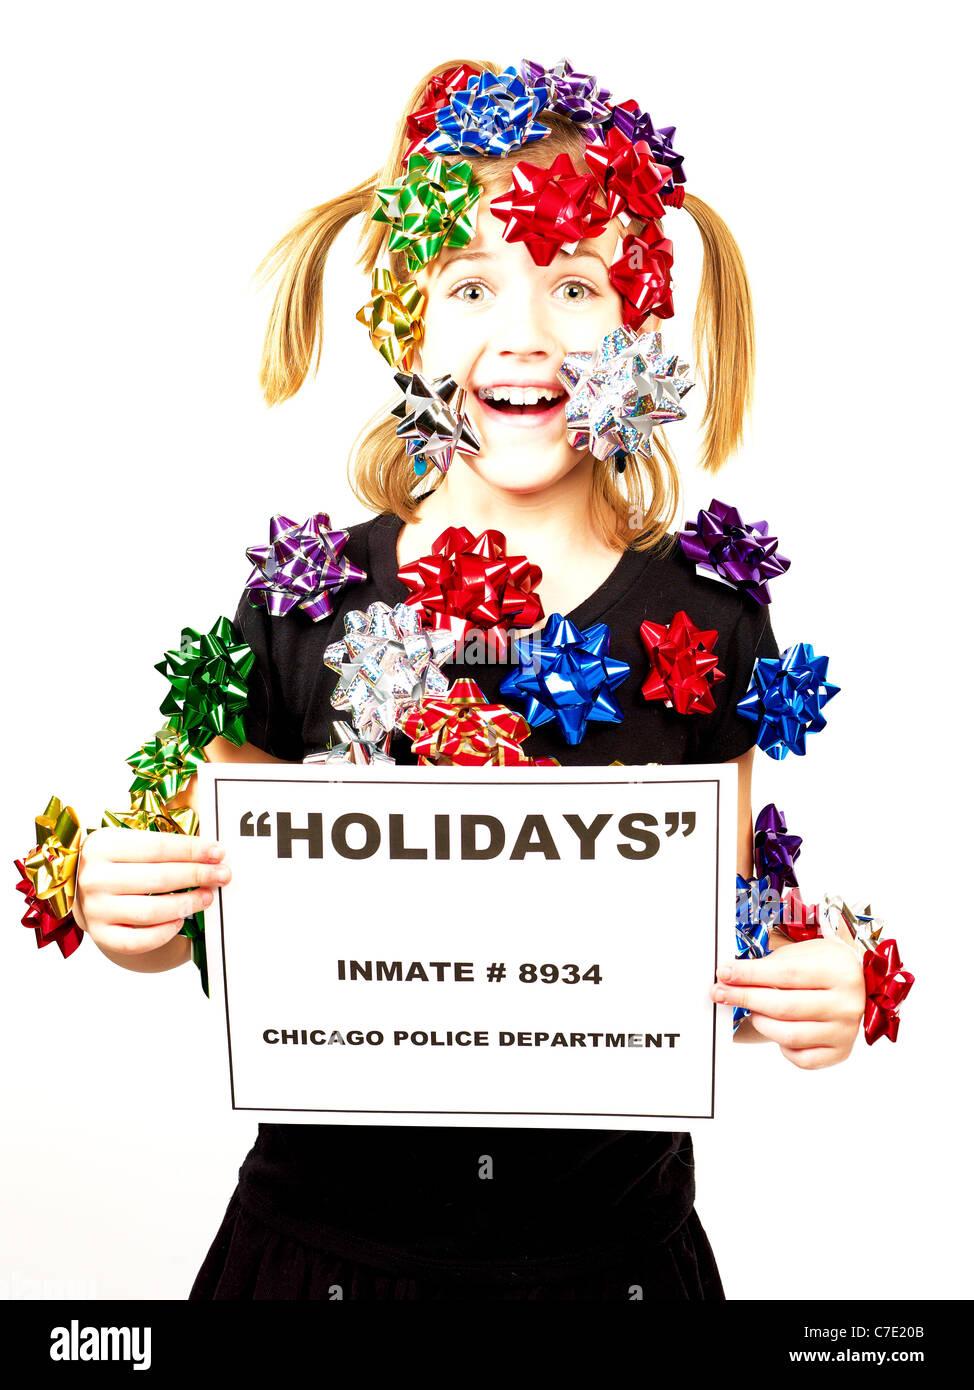 Christmas Bandit, girl with bows and ribbons - Stock Image